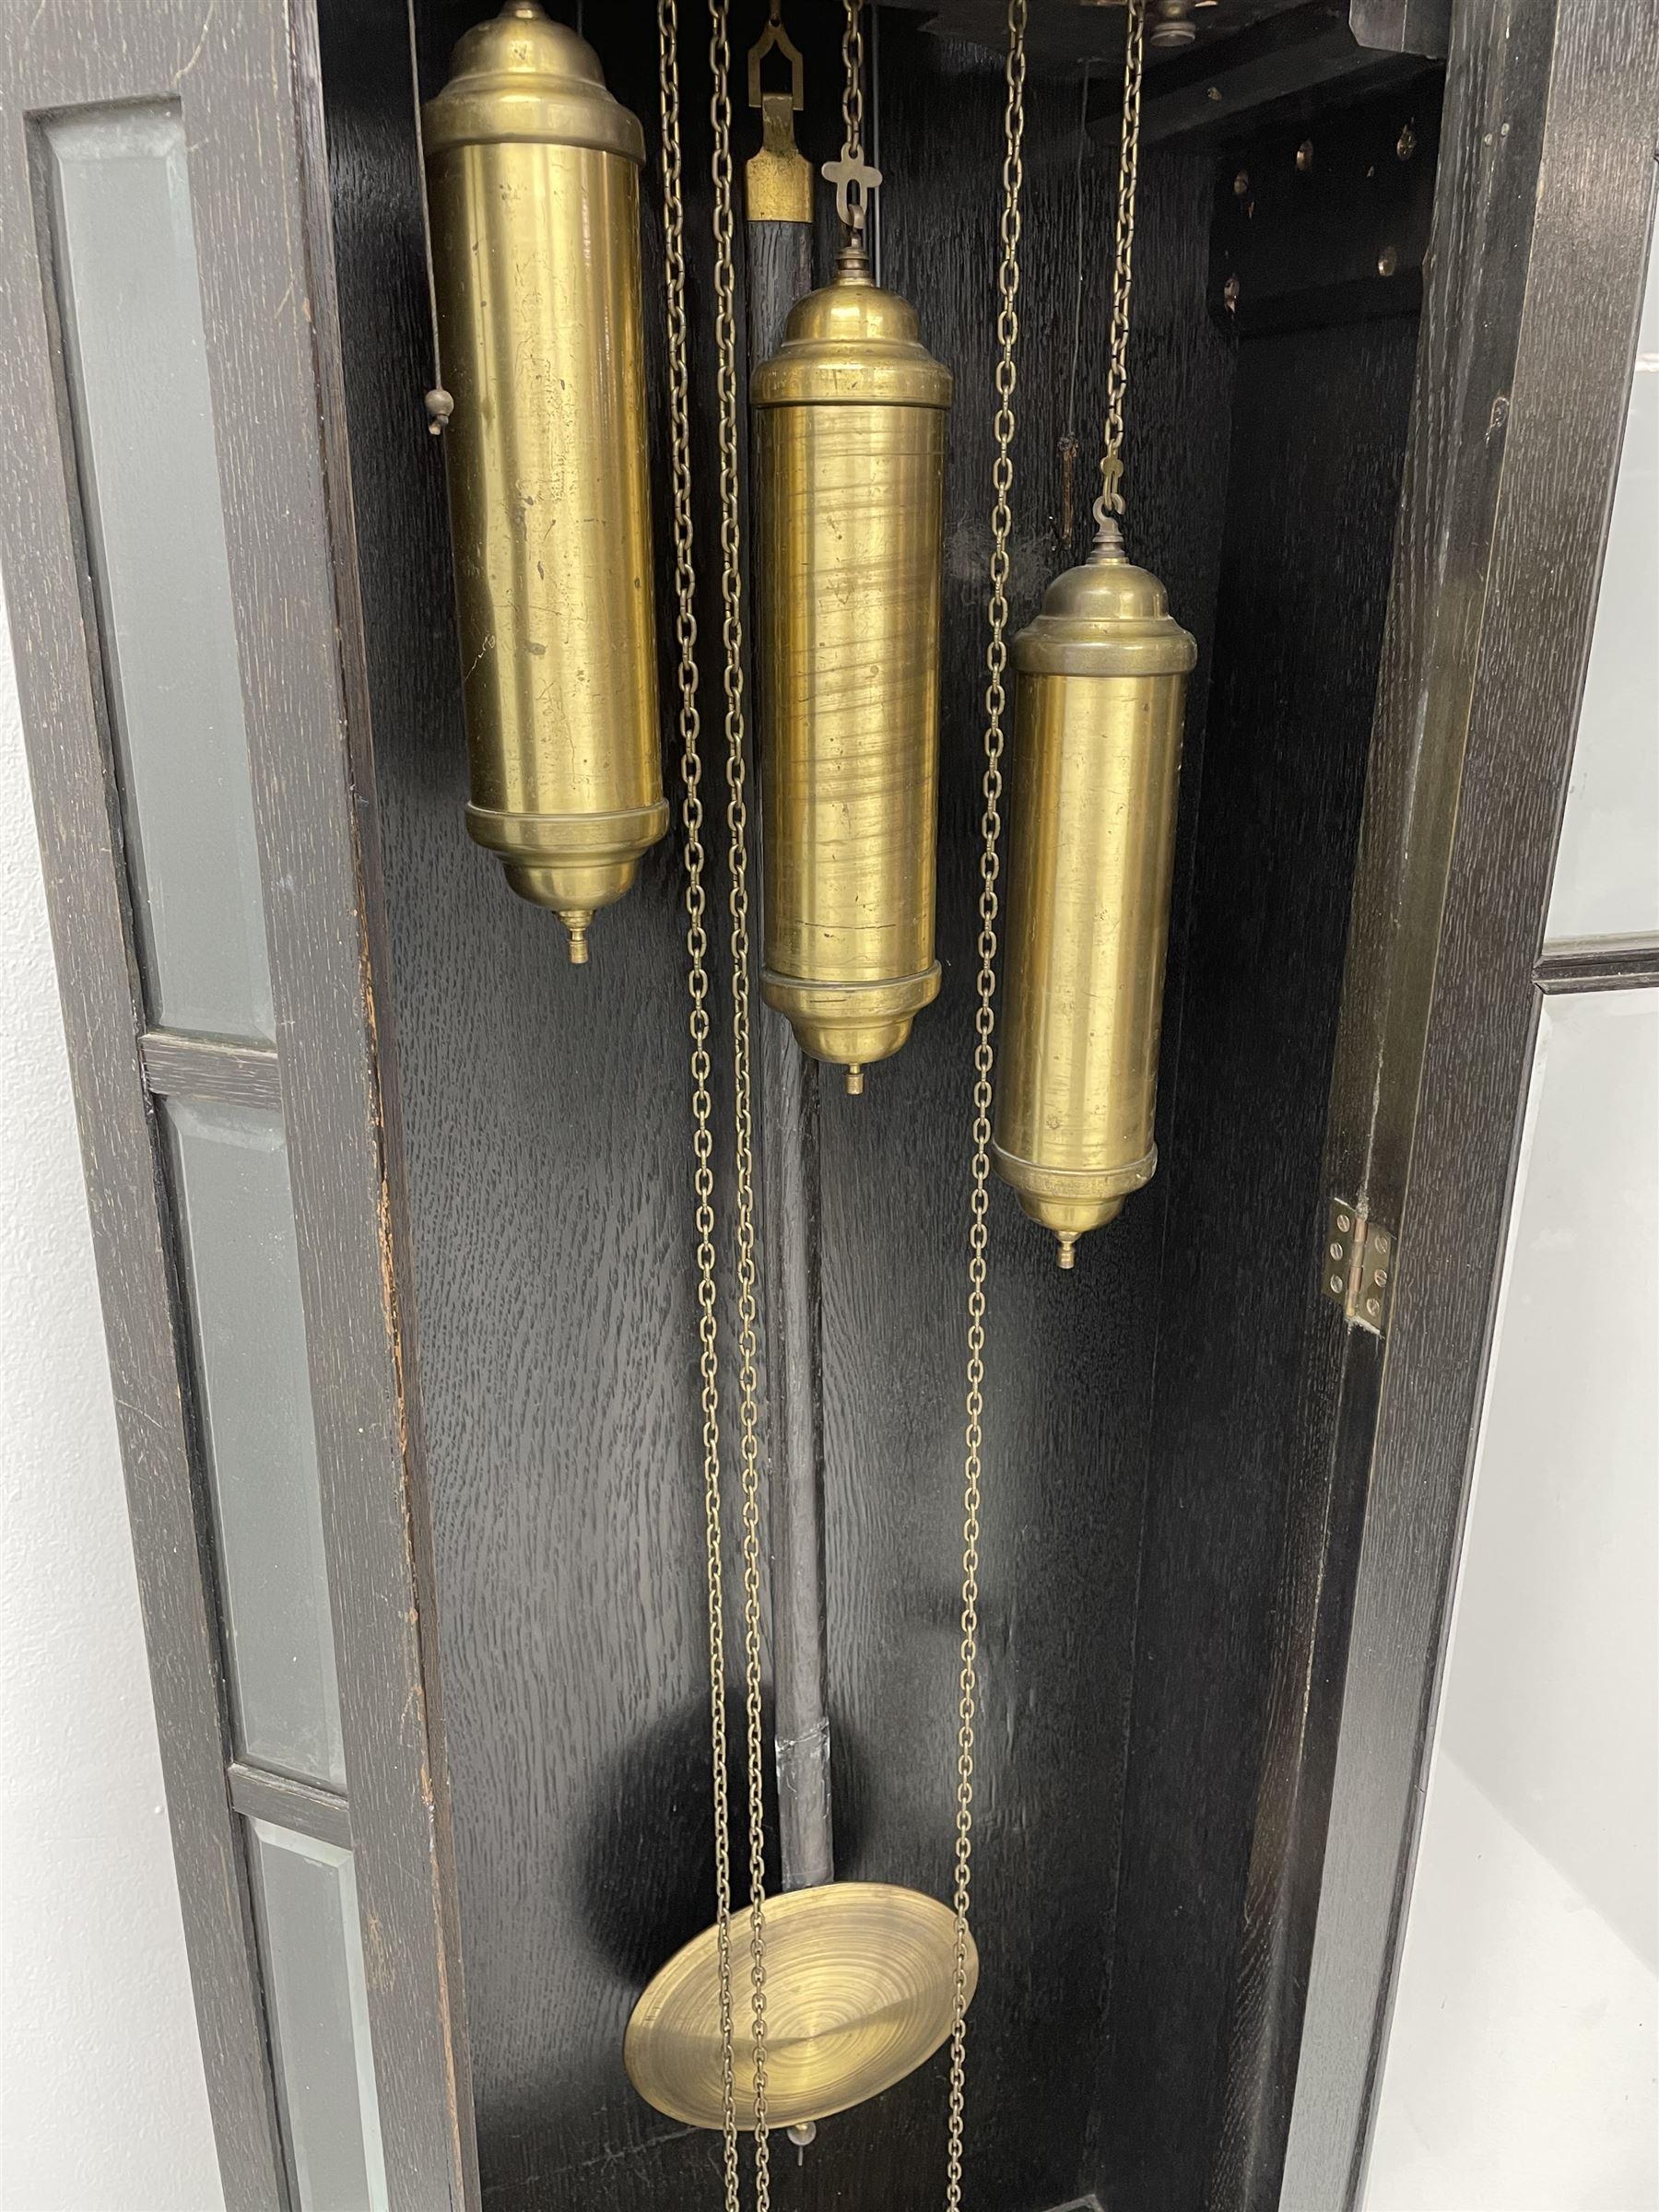 Early 20th century oak longcase clock - Image 2 of 9